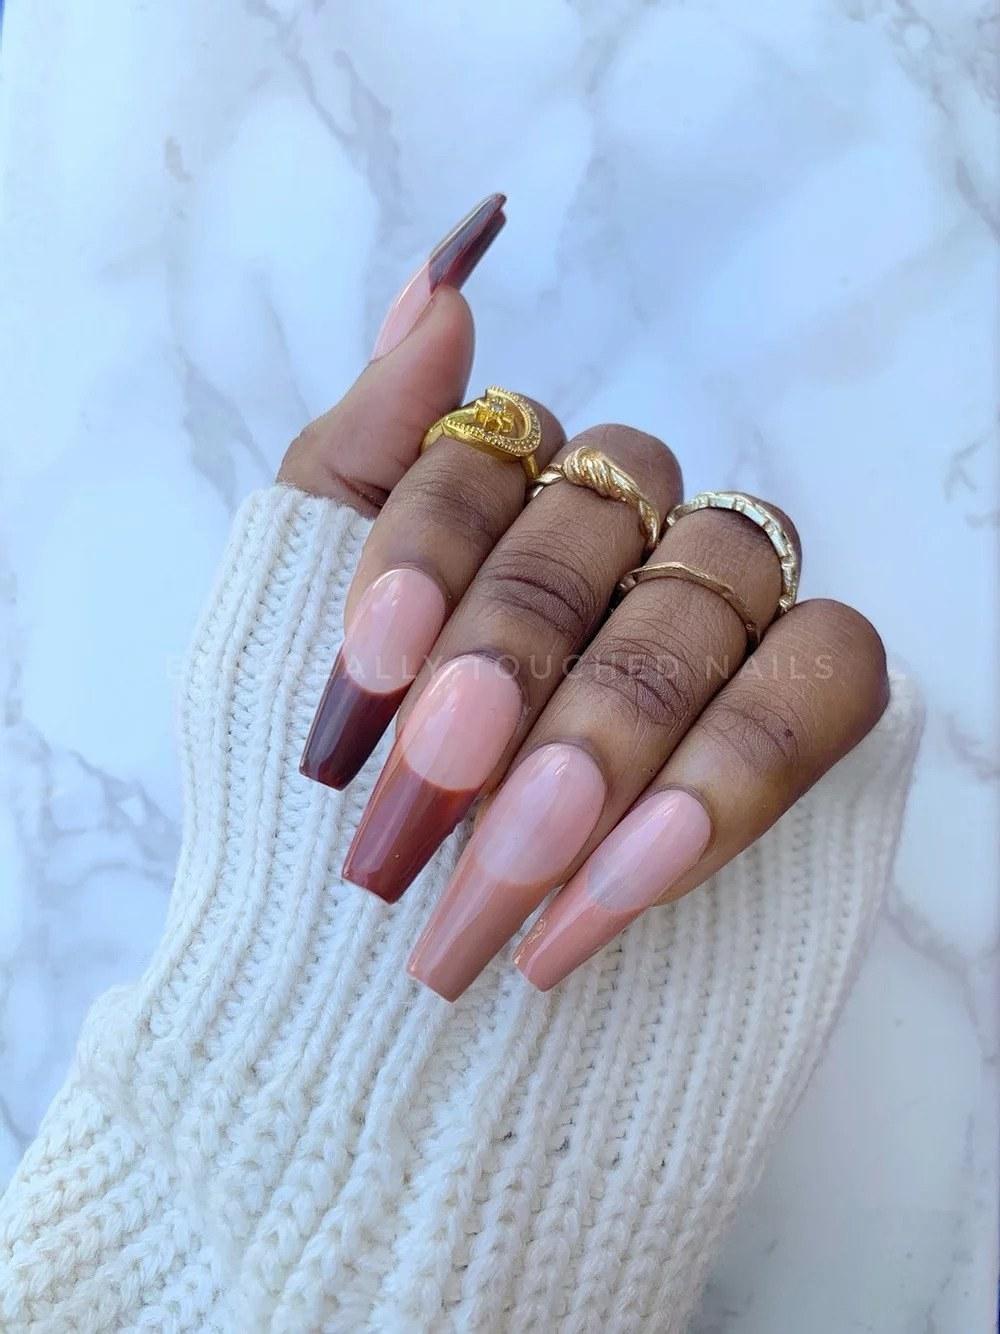 Model wearing press on nails